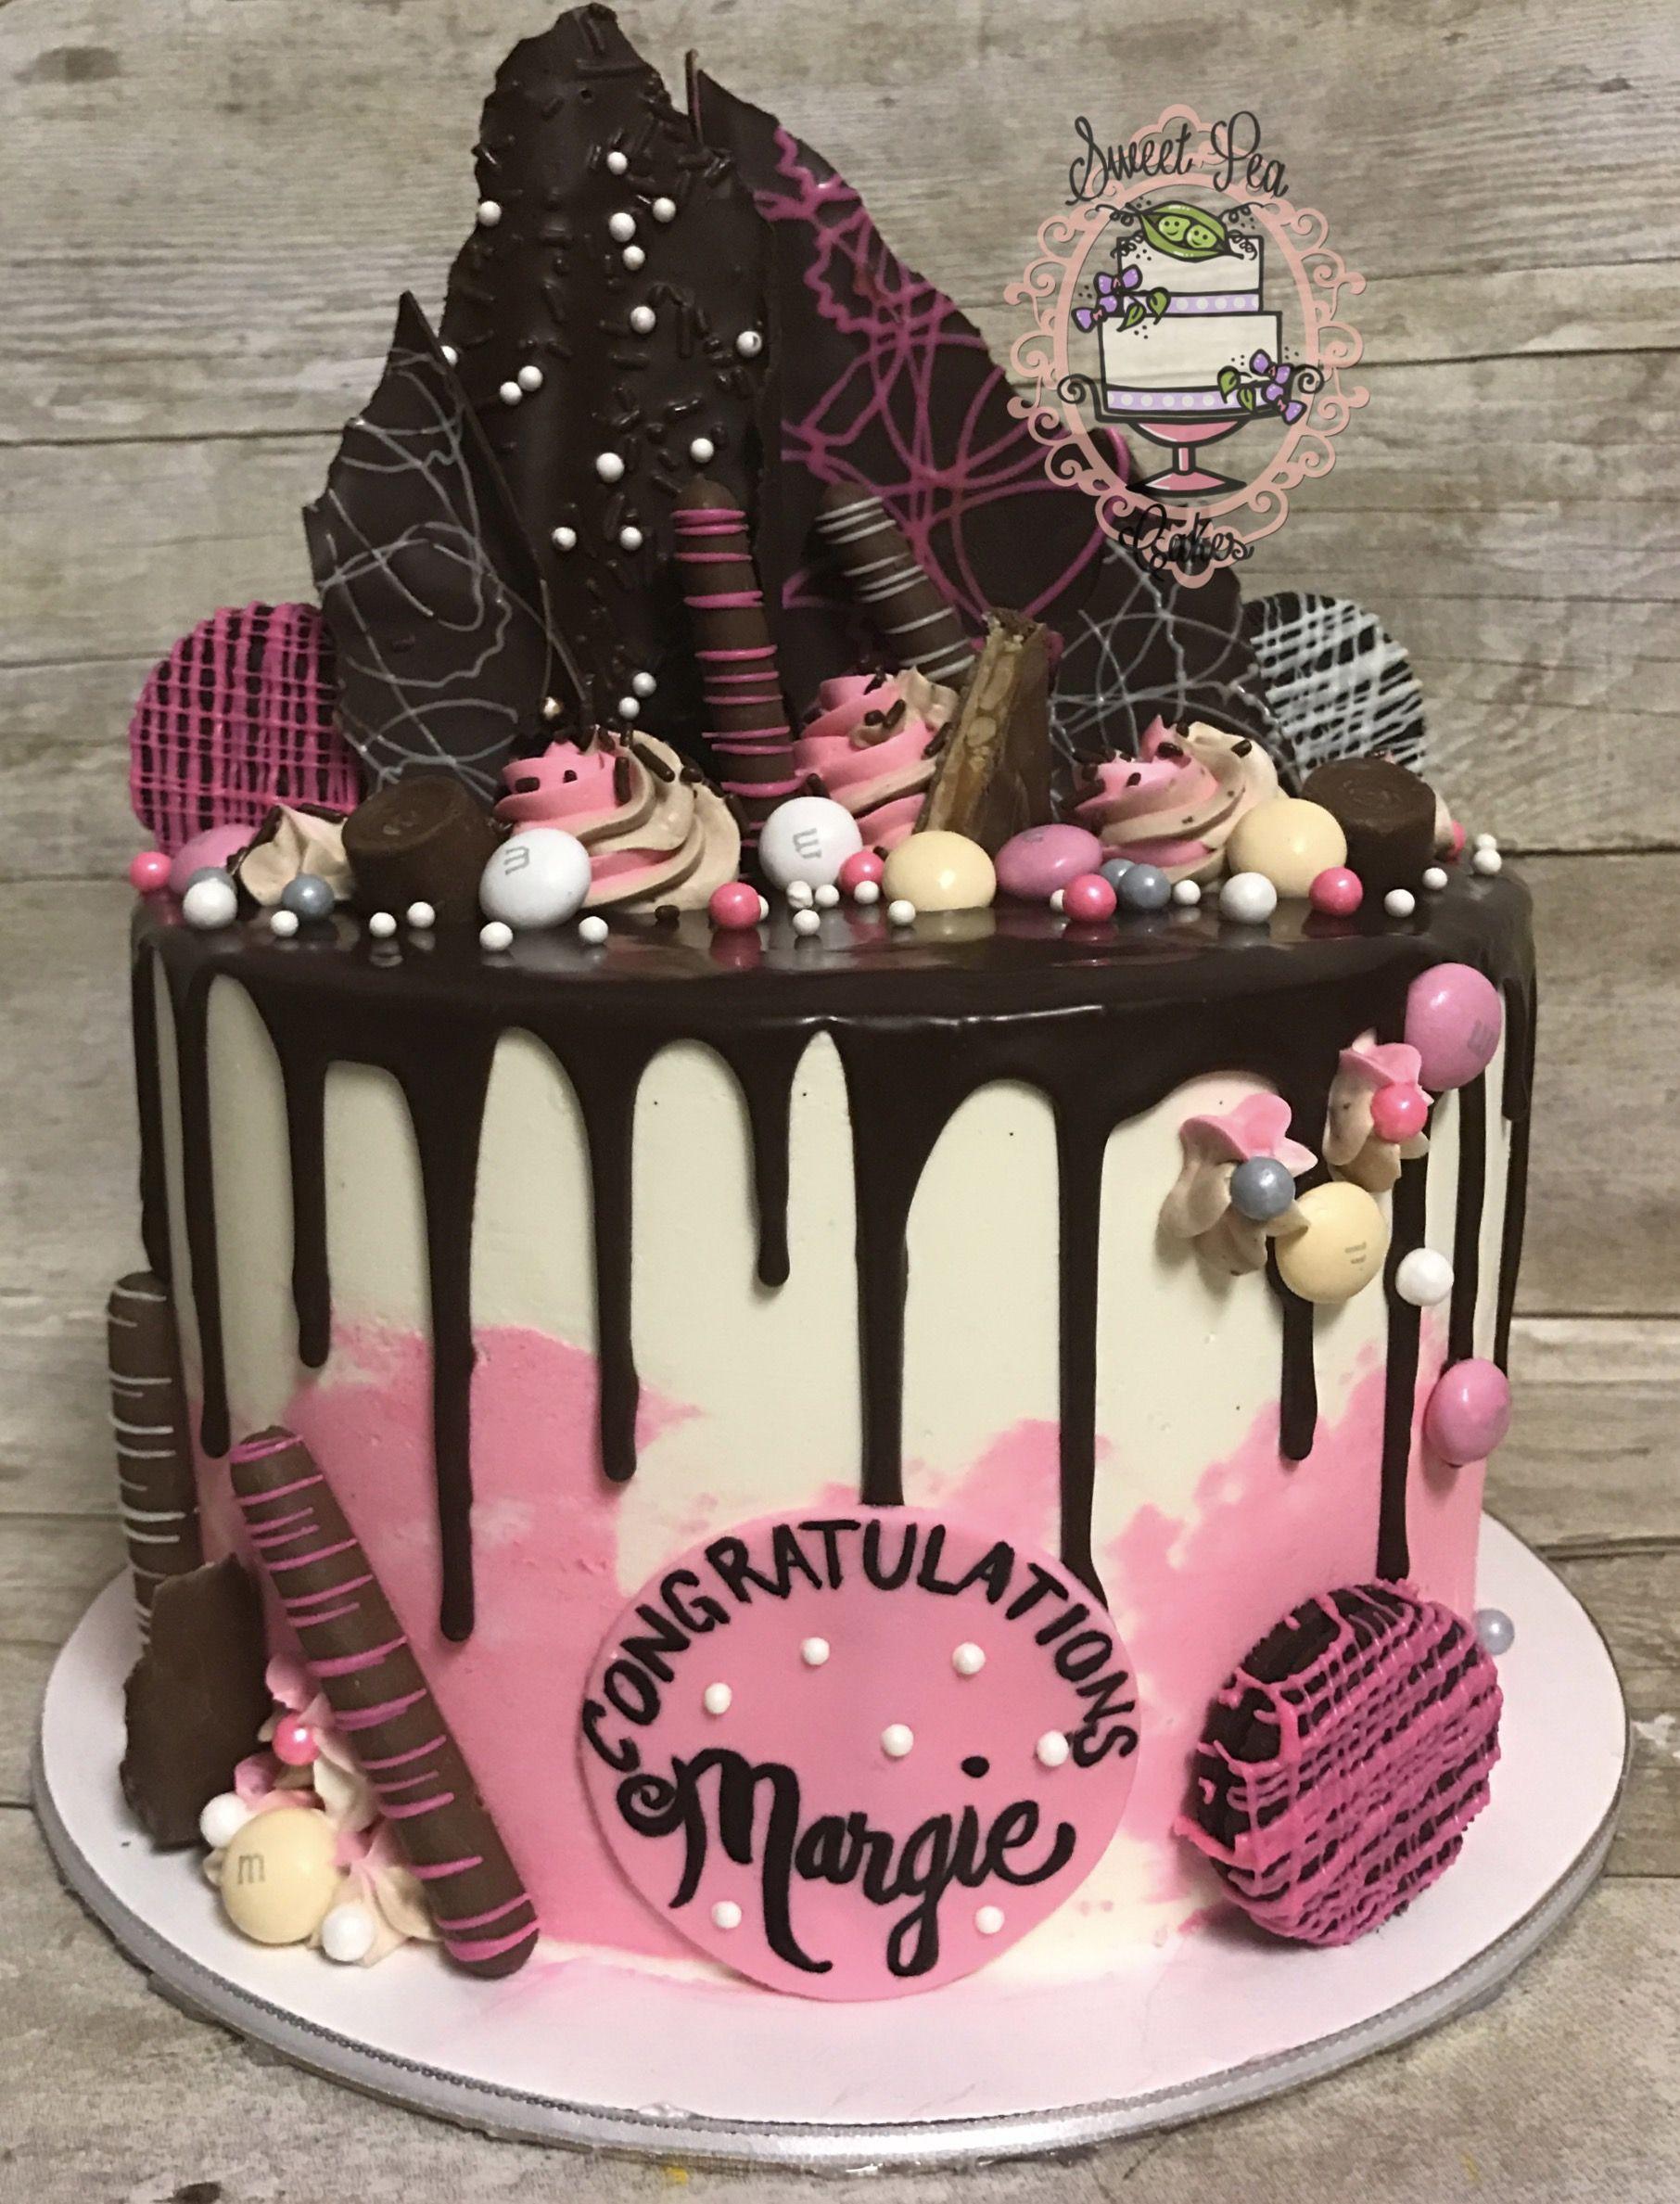 Astounding Sweet Pea Cakes Chocolate Drop Cake El Paso Tx Sweetpeacakesep Personalised Birthday Cards Vishlily Jamesorg